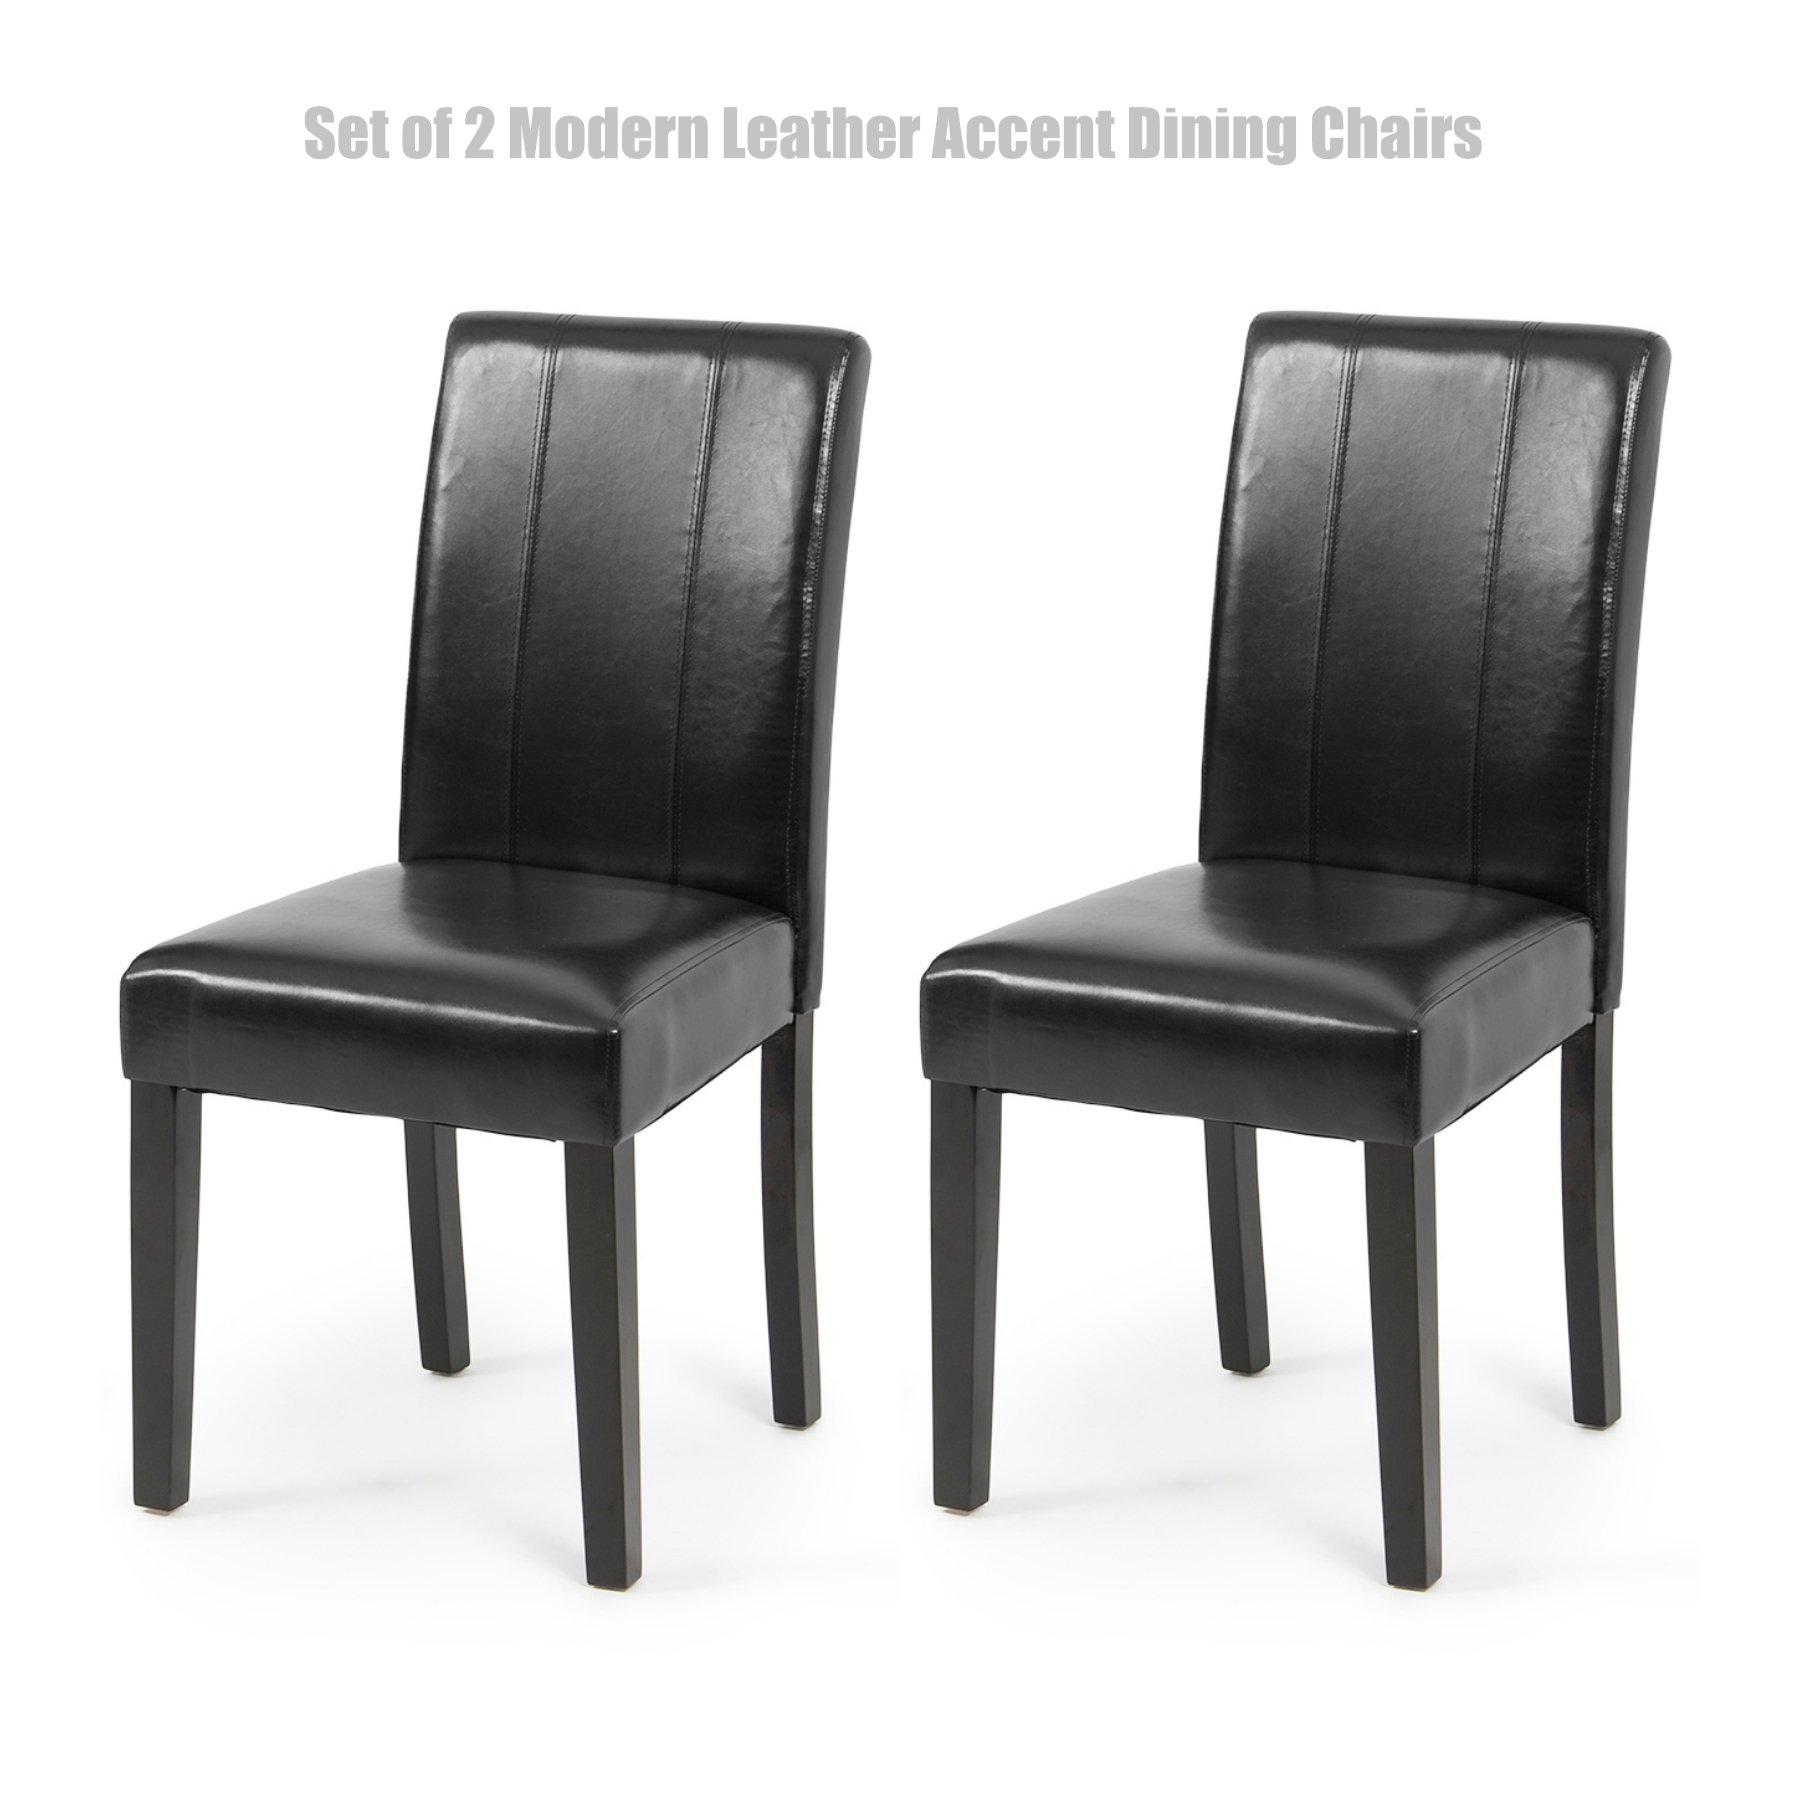 Modern Design High Backrest Dining Chairs Sturdy Hardwood Legs Unique PU Leather High Density Foam Seat Home Office Furniture Set of 2 Black #1452bk